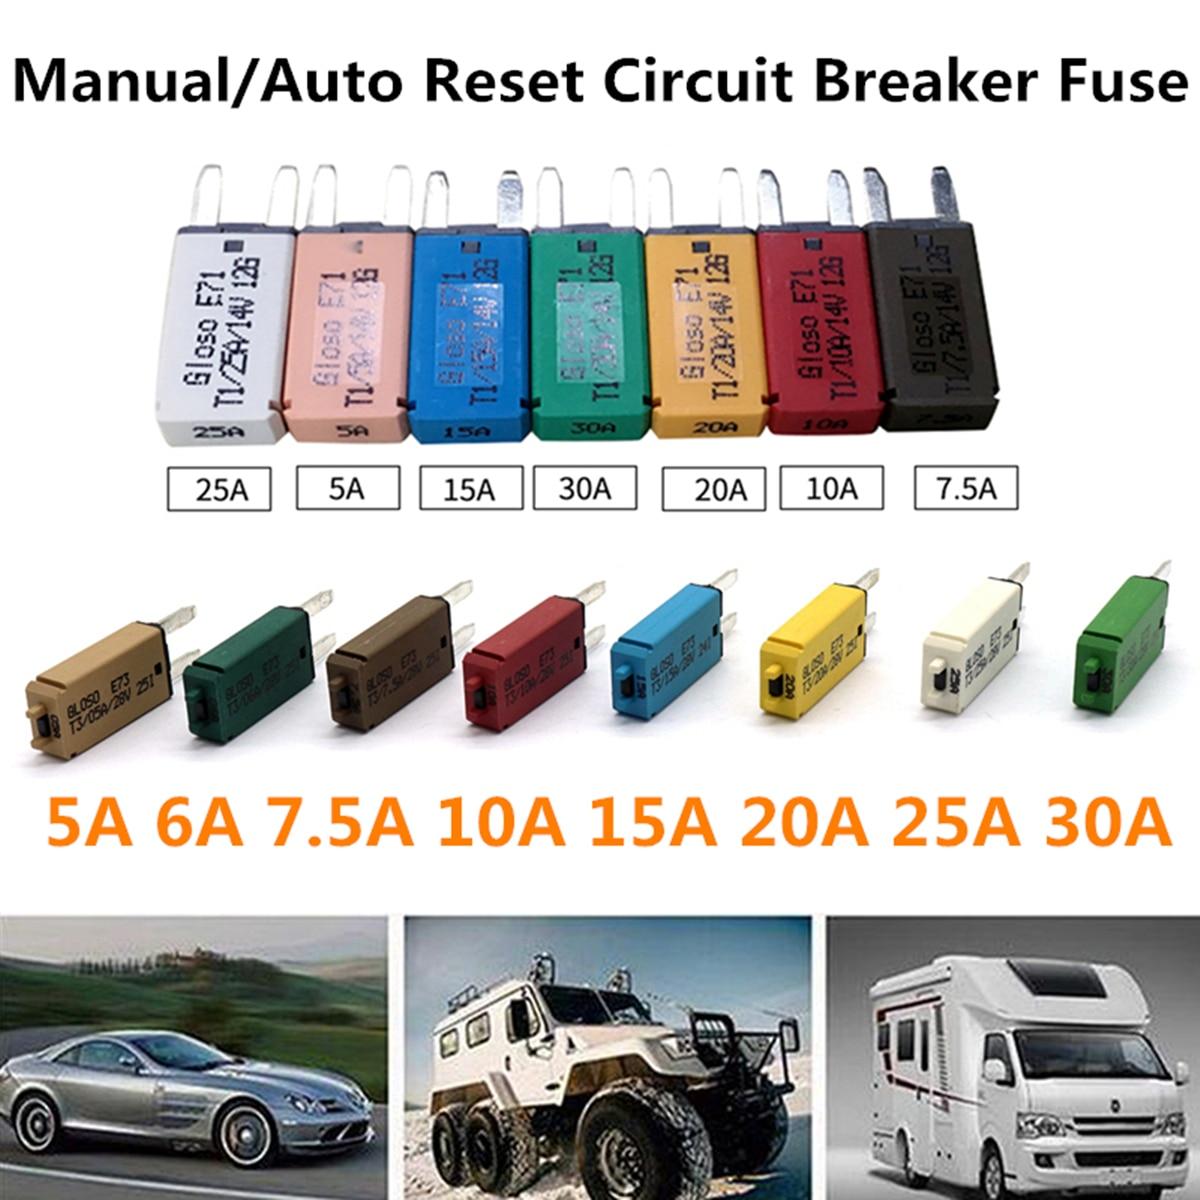 7 ATM Mini Blade Fuse Manual Reset Breaker Car Truck Corrosion Resistance